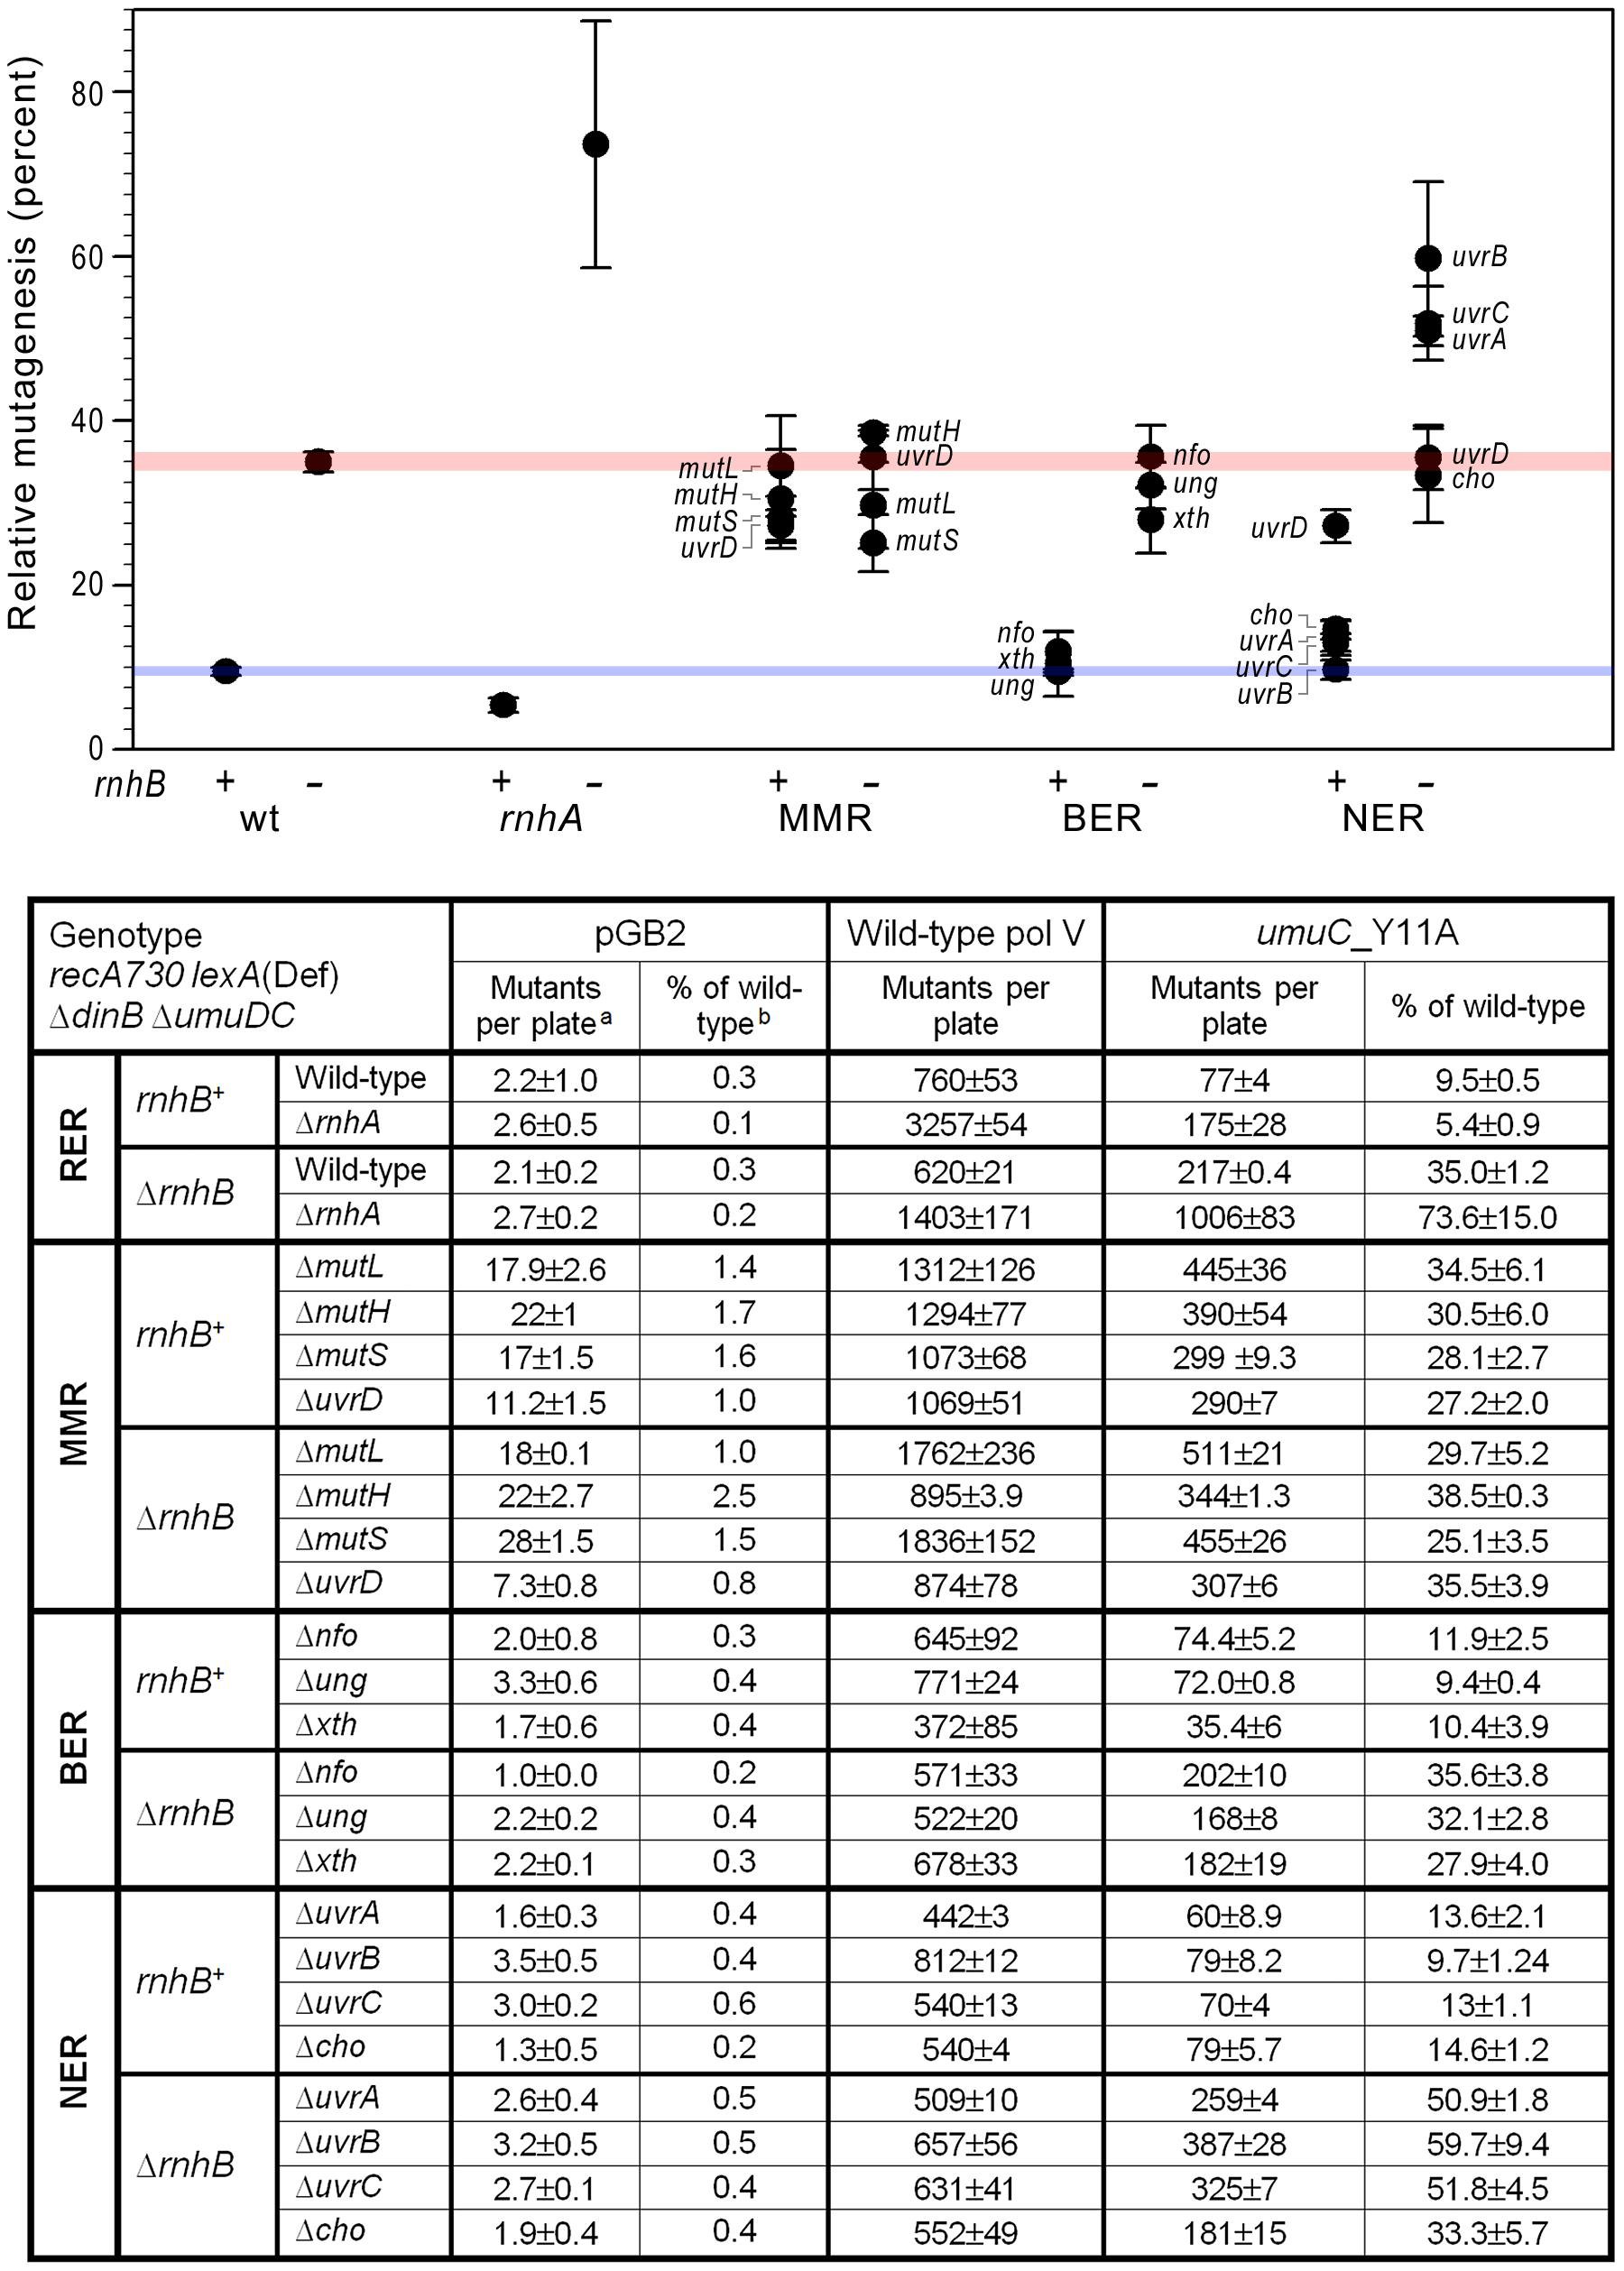 Effect of inactivating RER, MMR, BER and NER on spontaneous mutagenesis in <i>recA730 lexA</i>(Def) Δ<i>dinB</i> strains Δ<i>umuDC</i>.